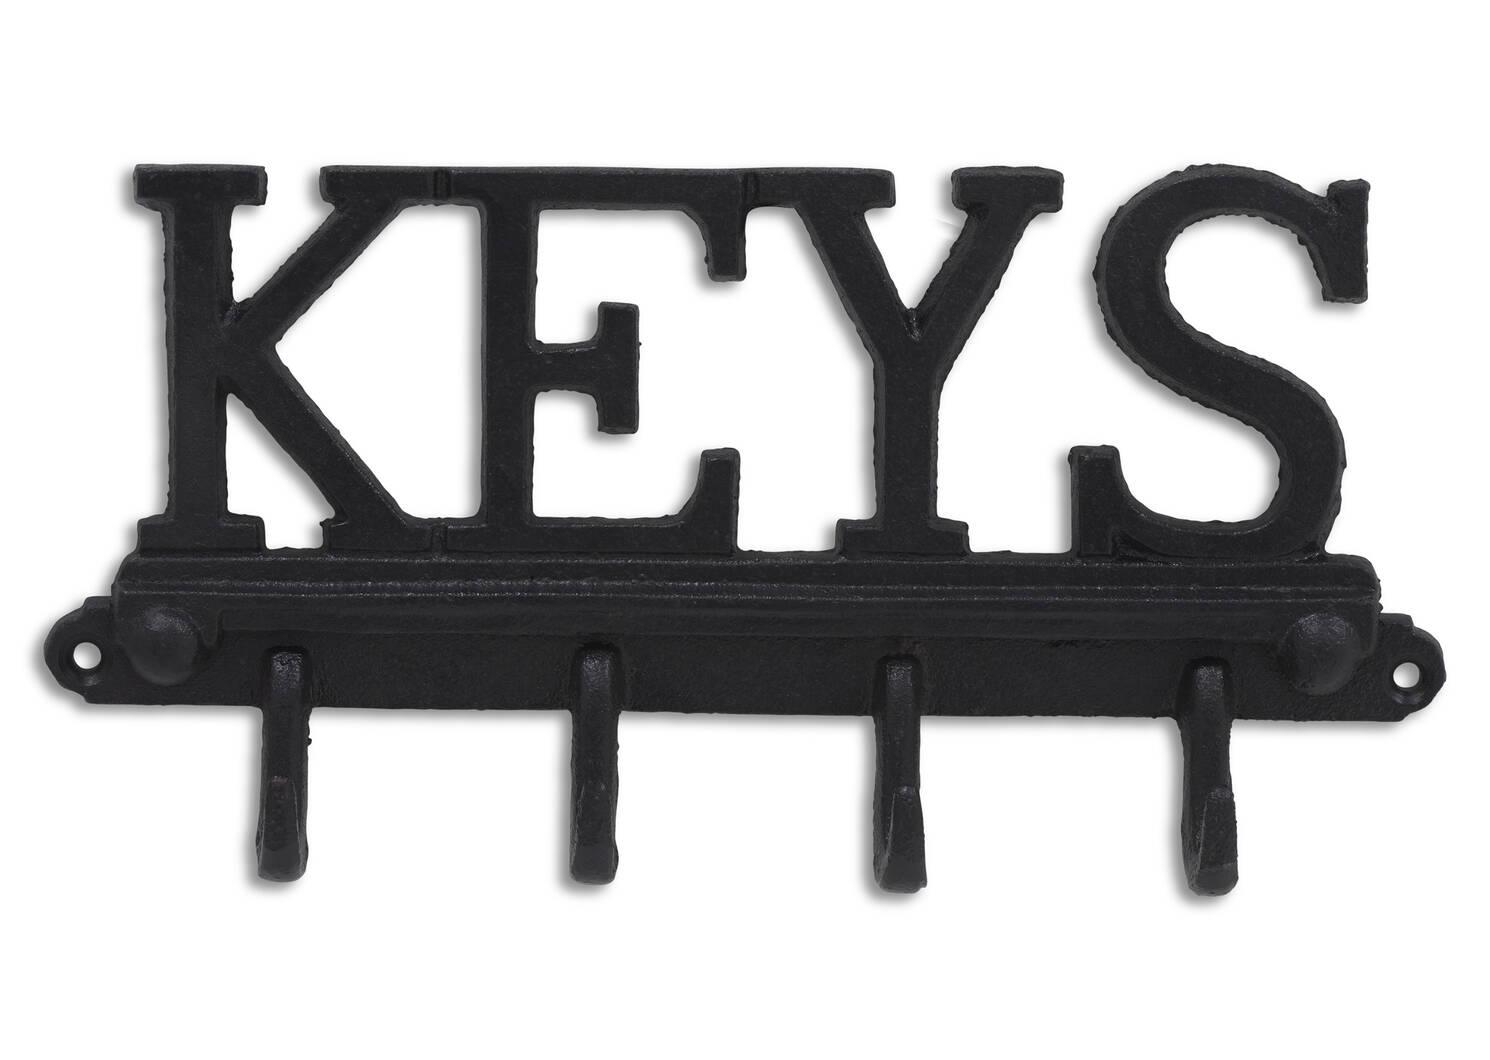 Kayde Keys Wall Hook